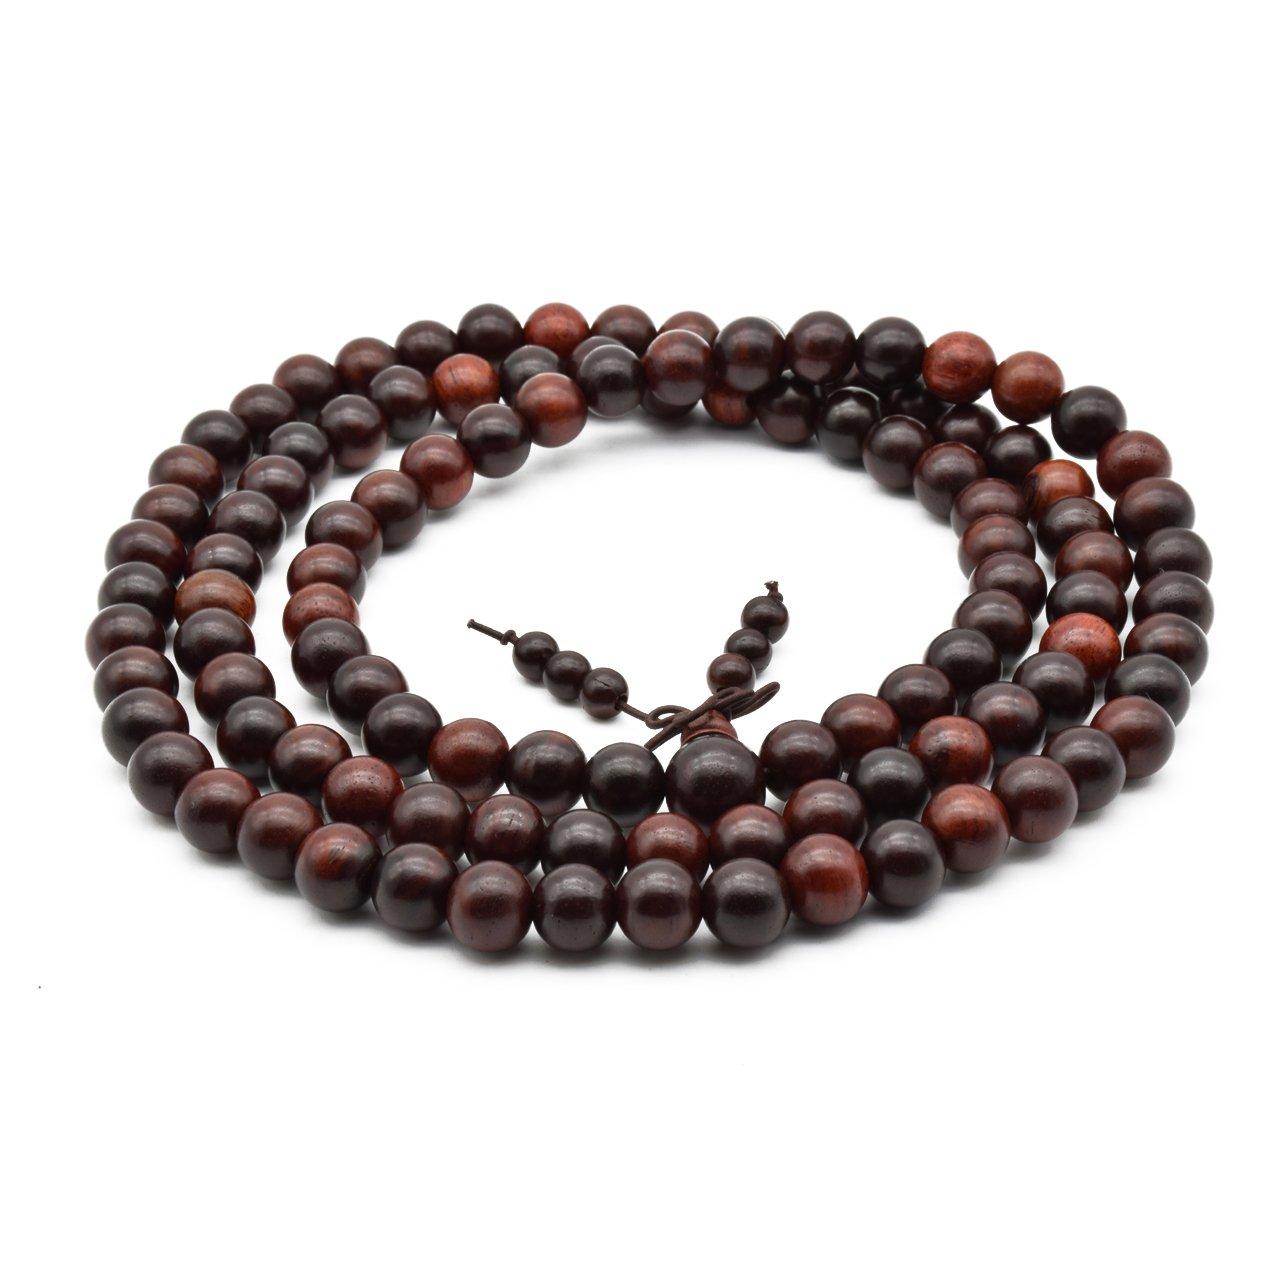 Zen Dear Unisex Natural Rosewood Prayer Beads Buddha Buddhist Prayer Meditation Mala Necklace Bracelet ZD-RSW-00-00